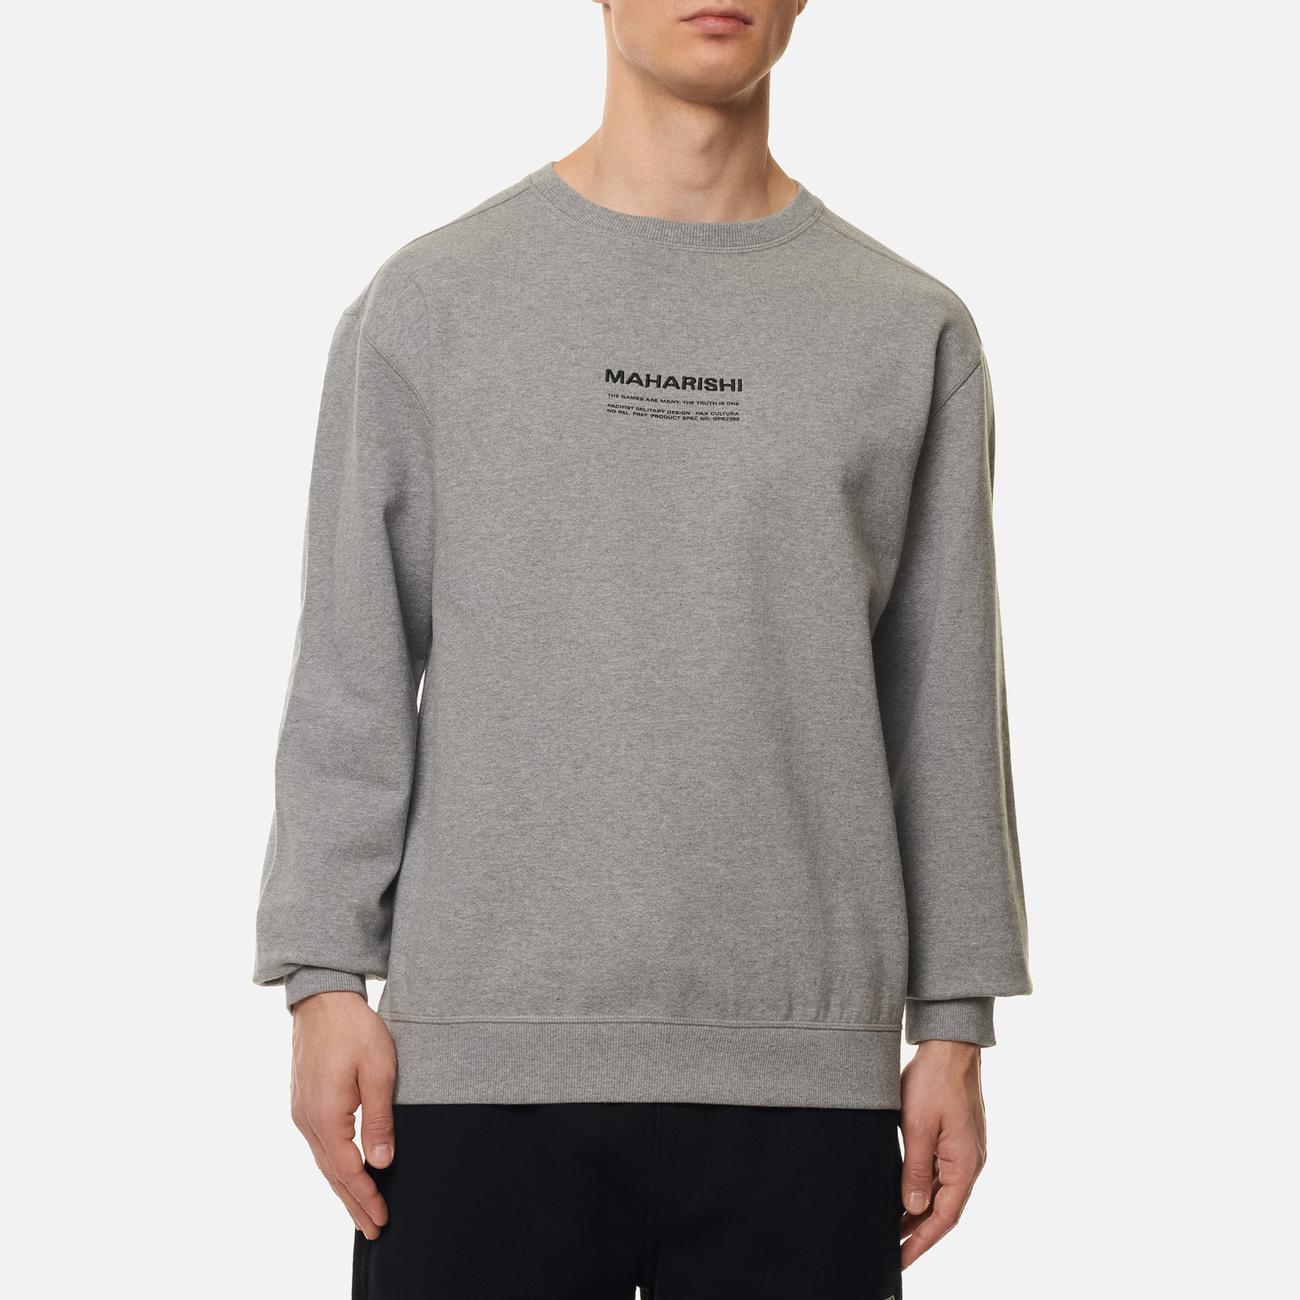 Мужская толстовка maharishi Organic Crew Military Type Embroidery Grey Marl